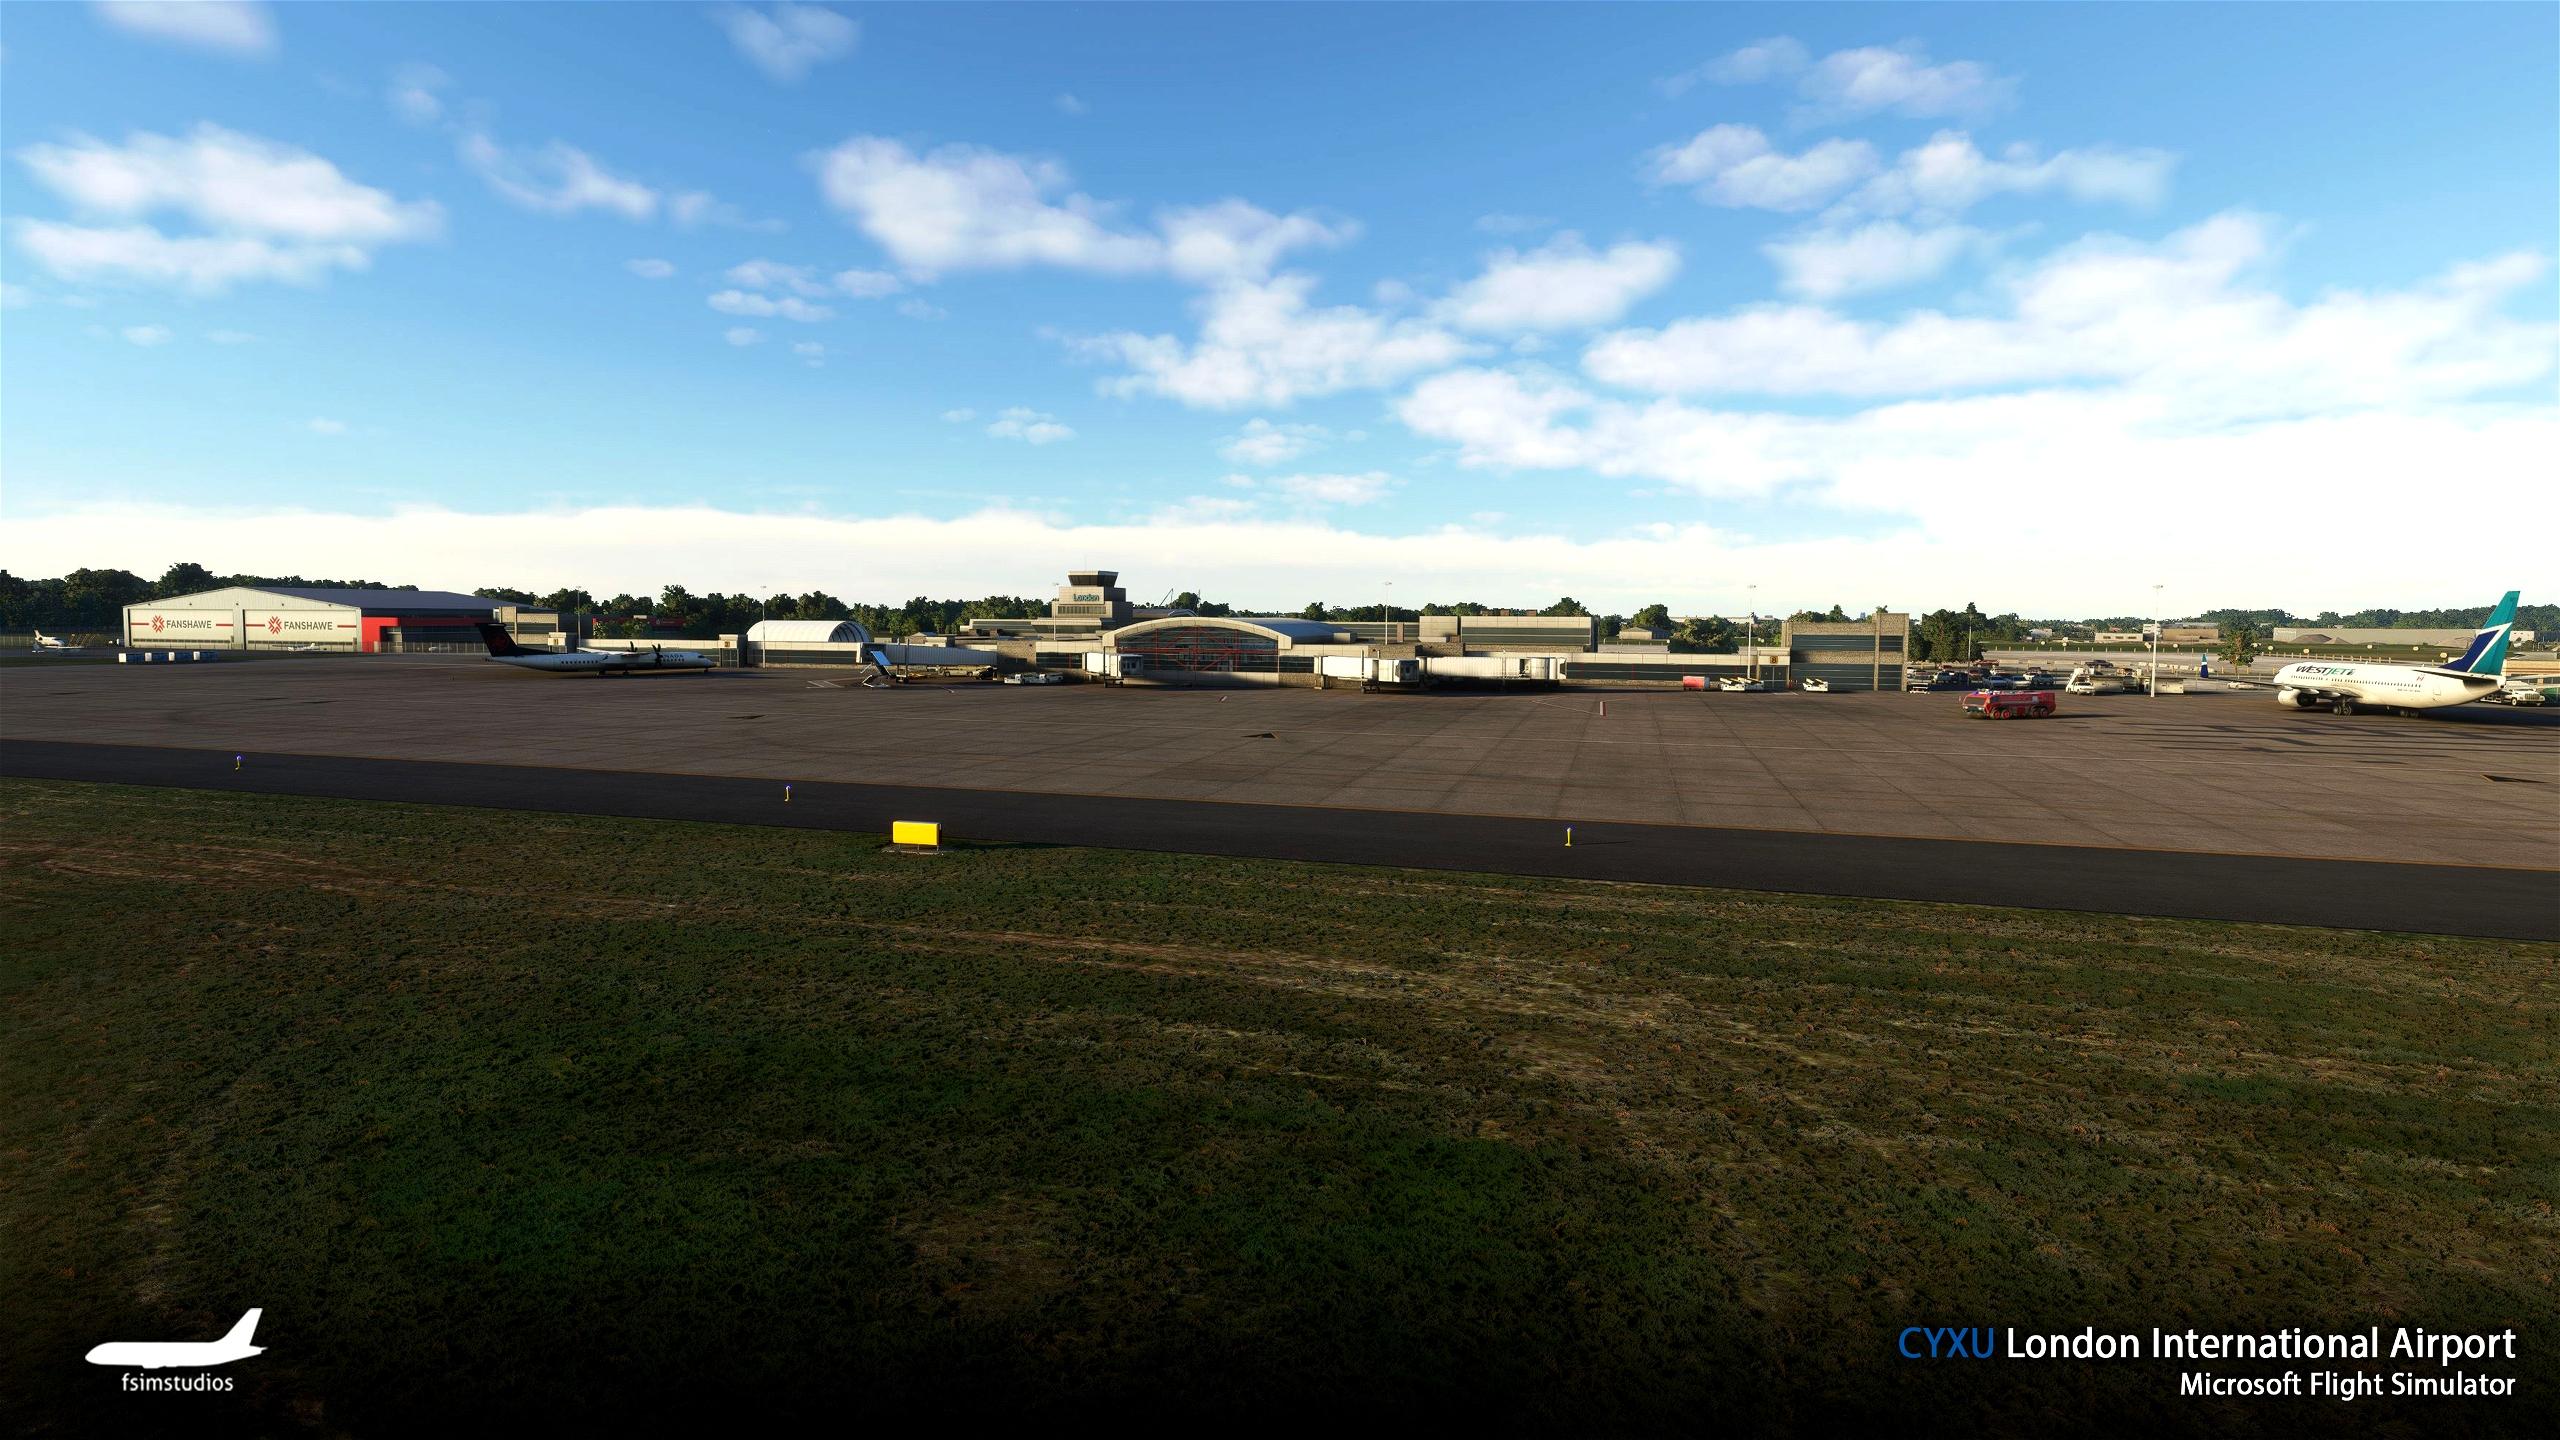 London International Airport CYXU  Microsoft Flight Simulator